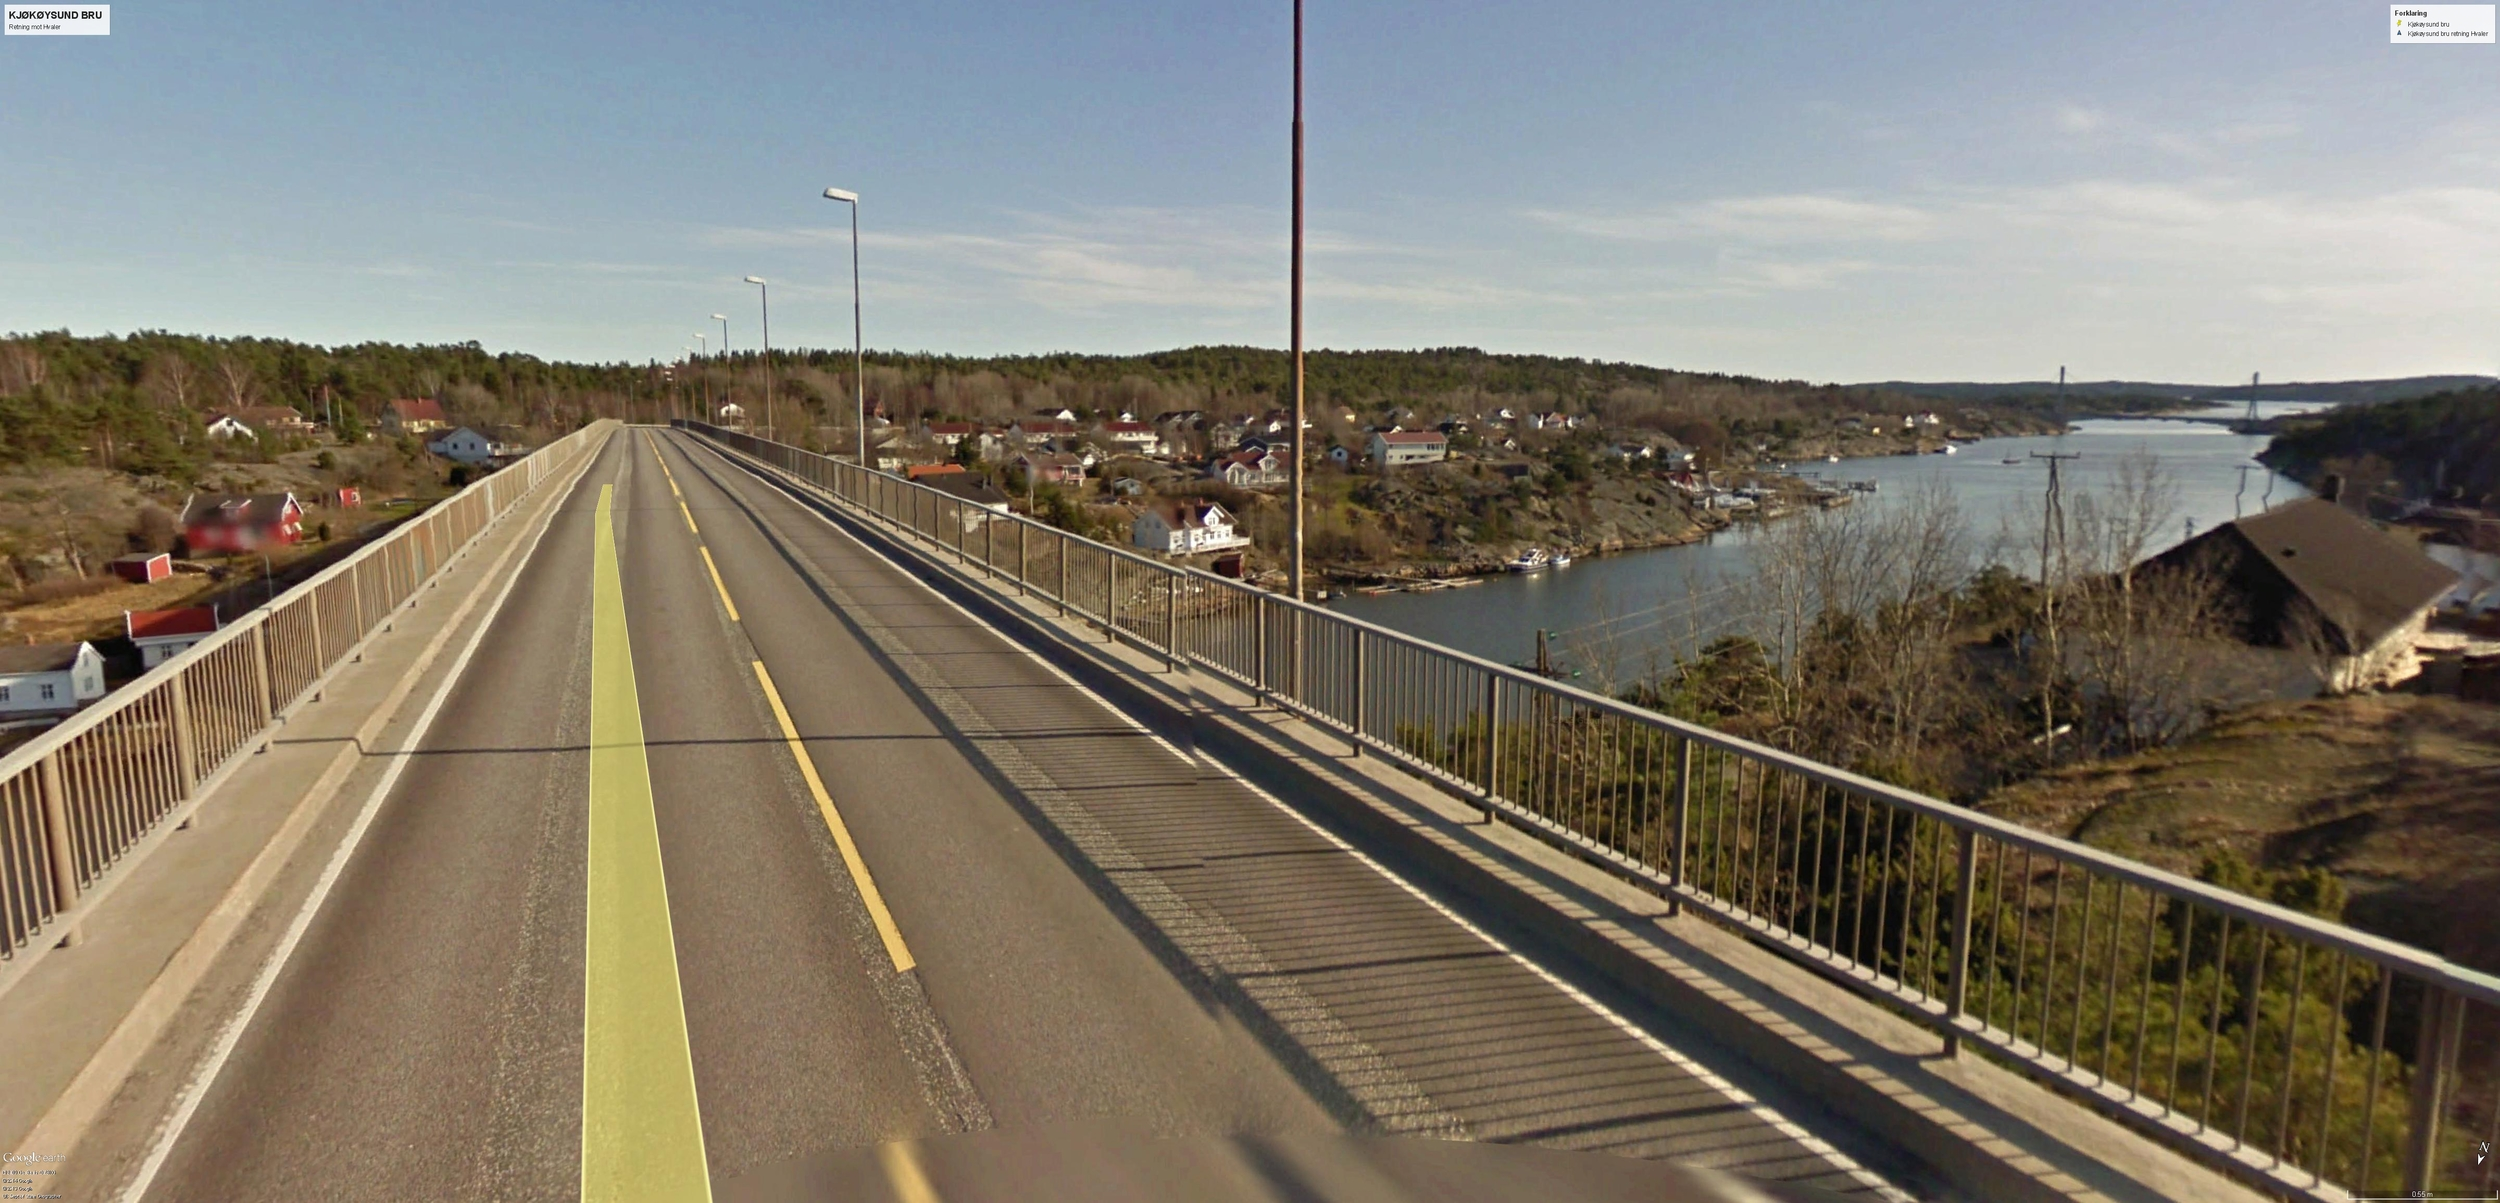 Kjøkøysund bru, retning Hvaler. Puttesund bru kan skimtes til høyre i bildet. © GOOGLE EARTH